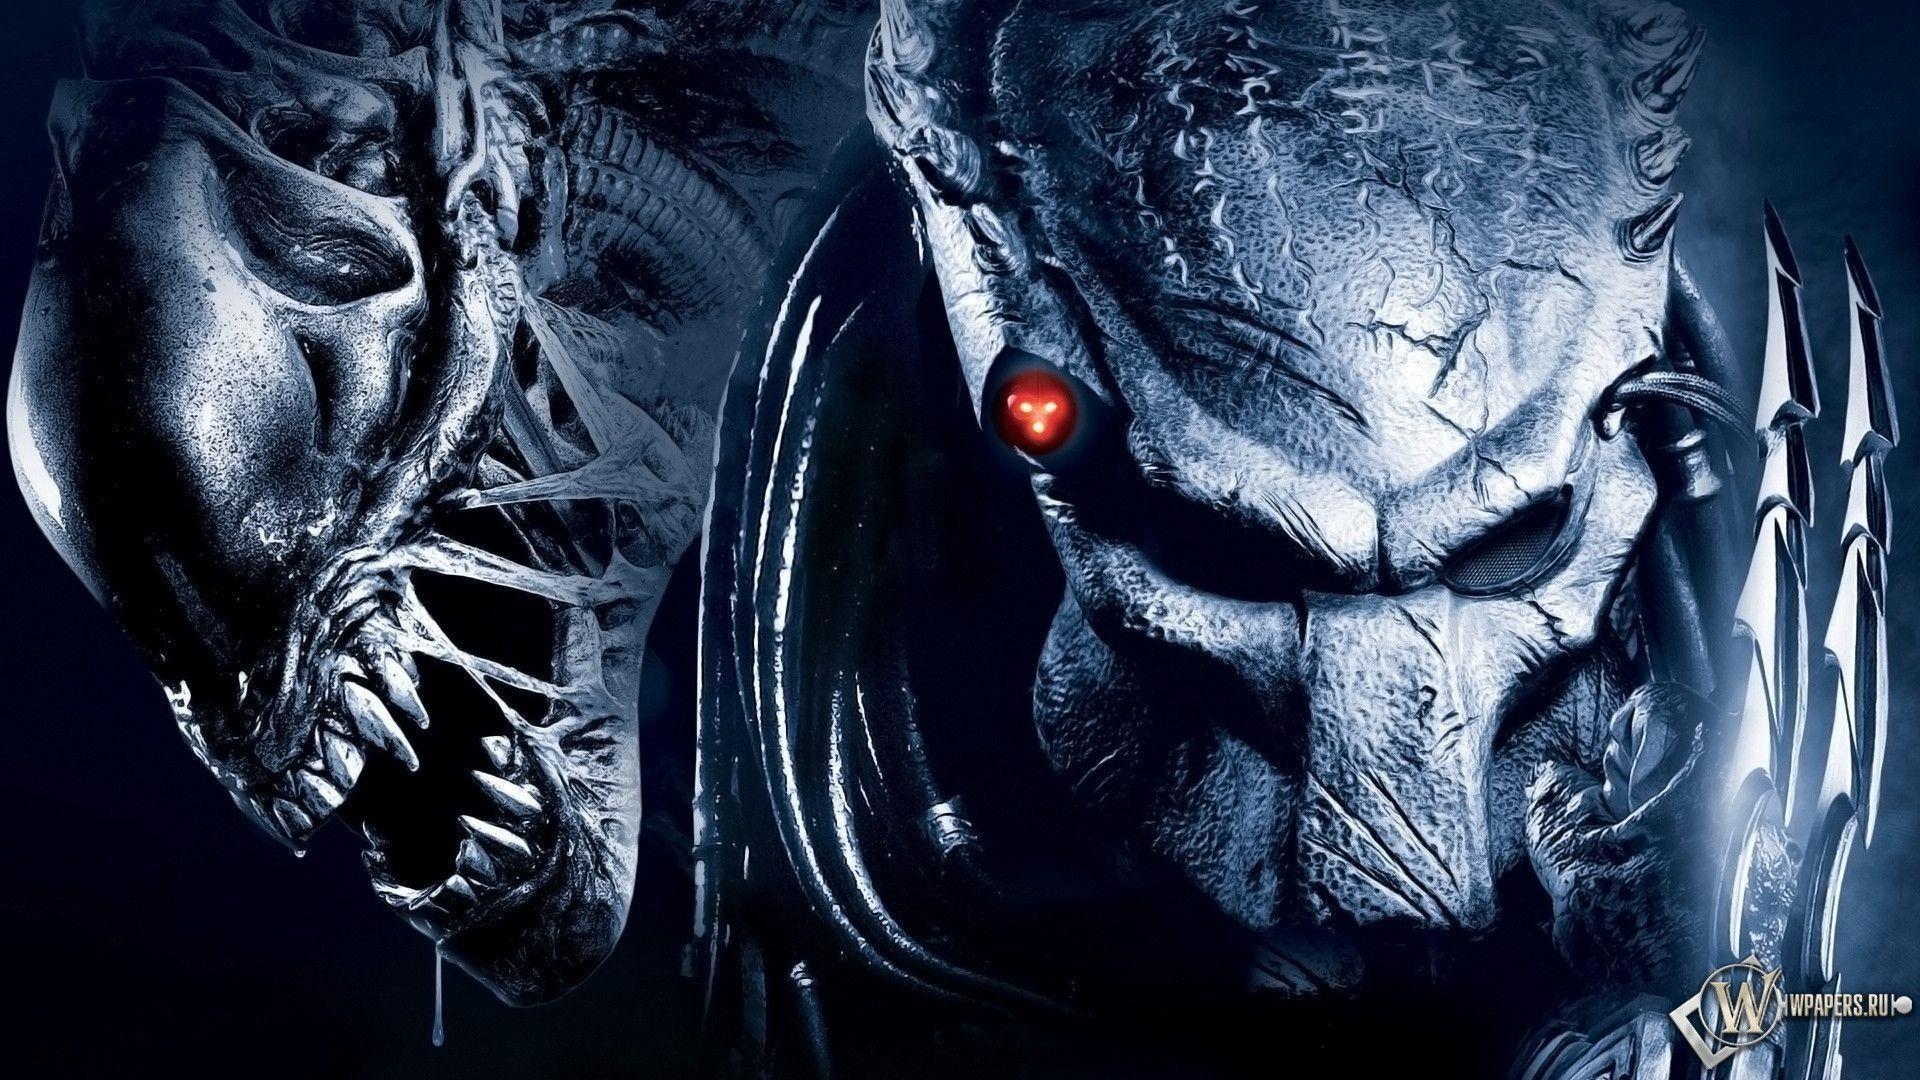 Aliens Vs Predator Wallpaper 75 Images